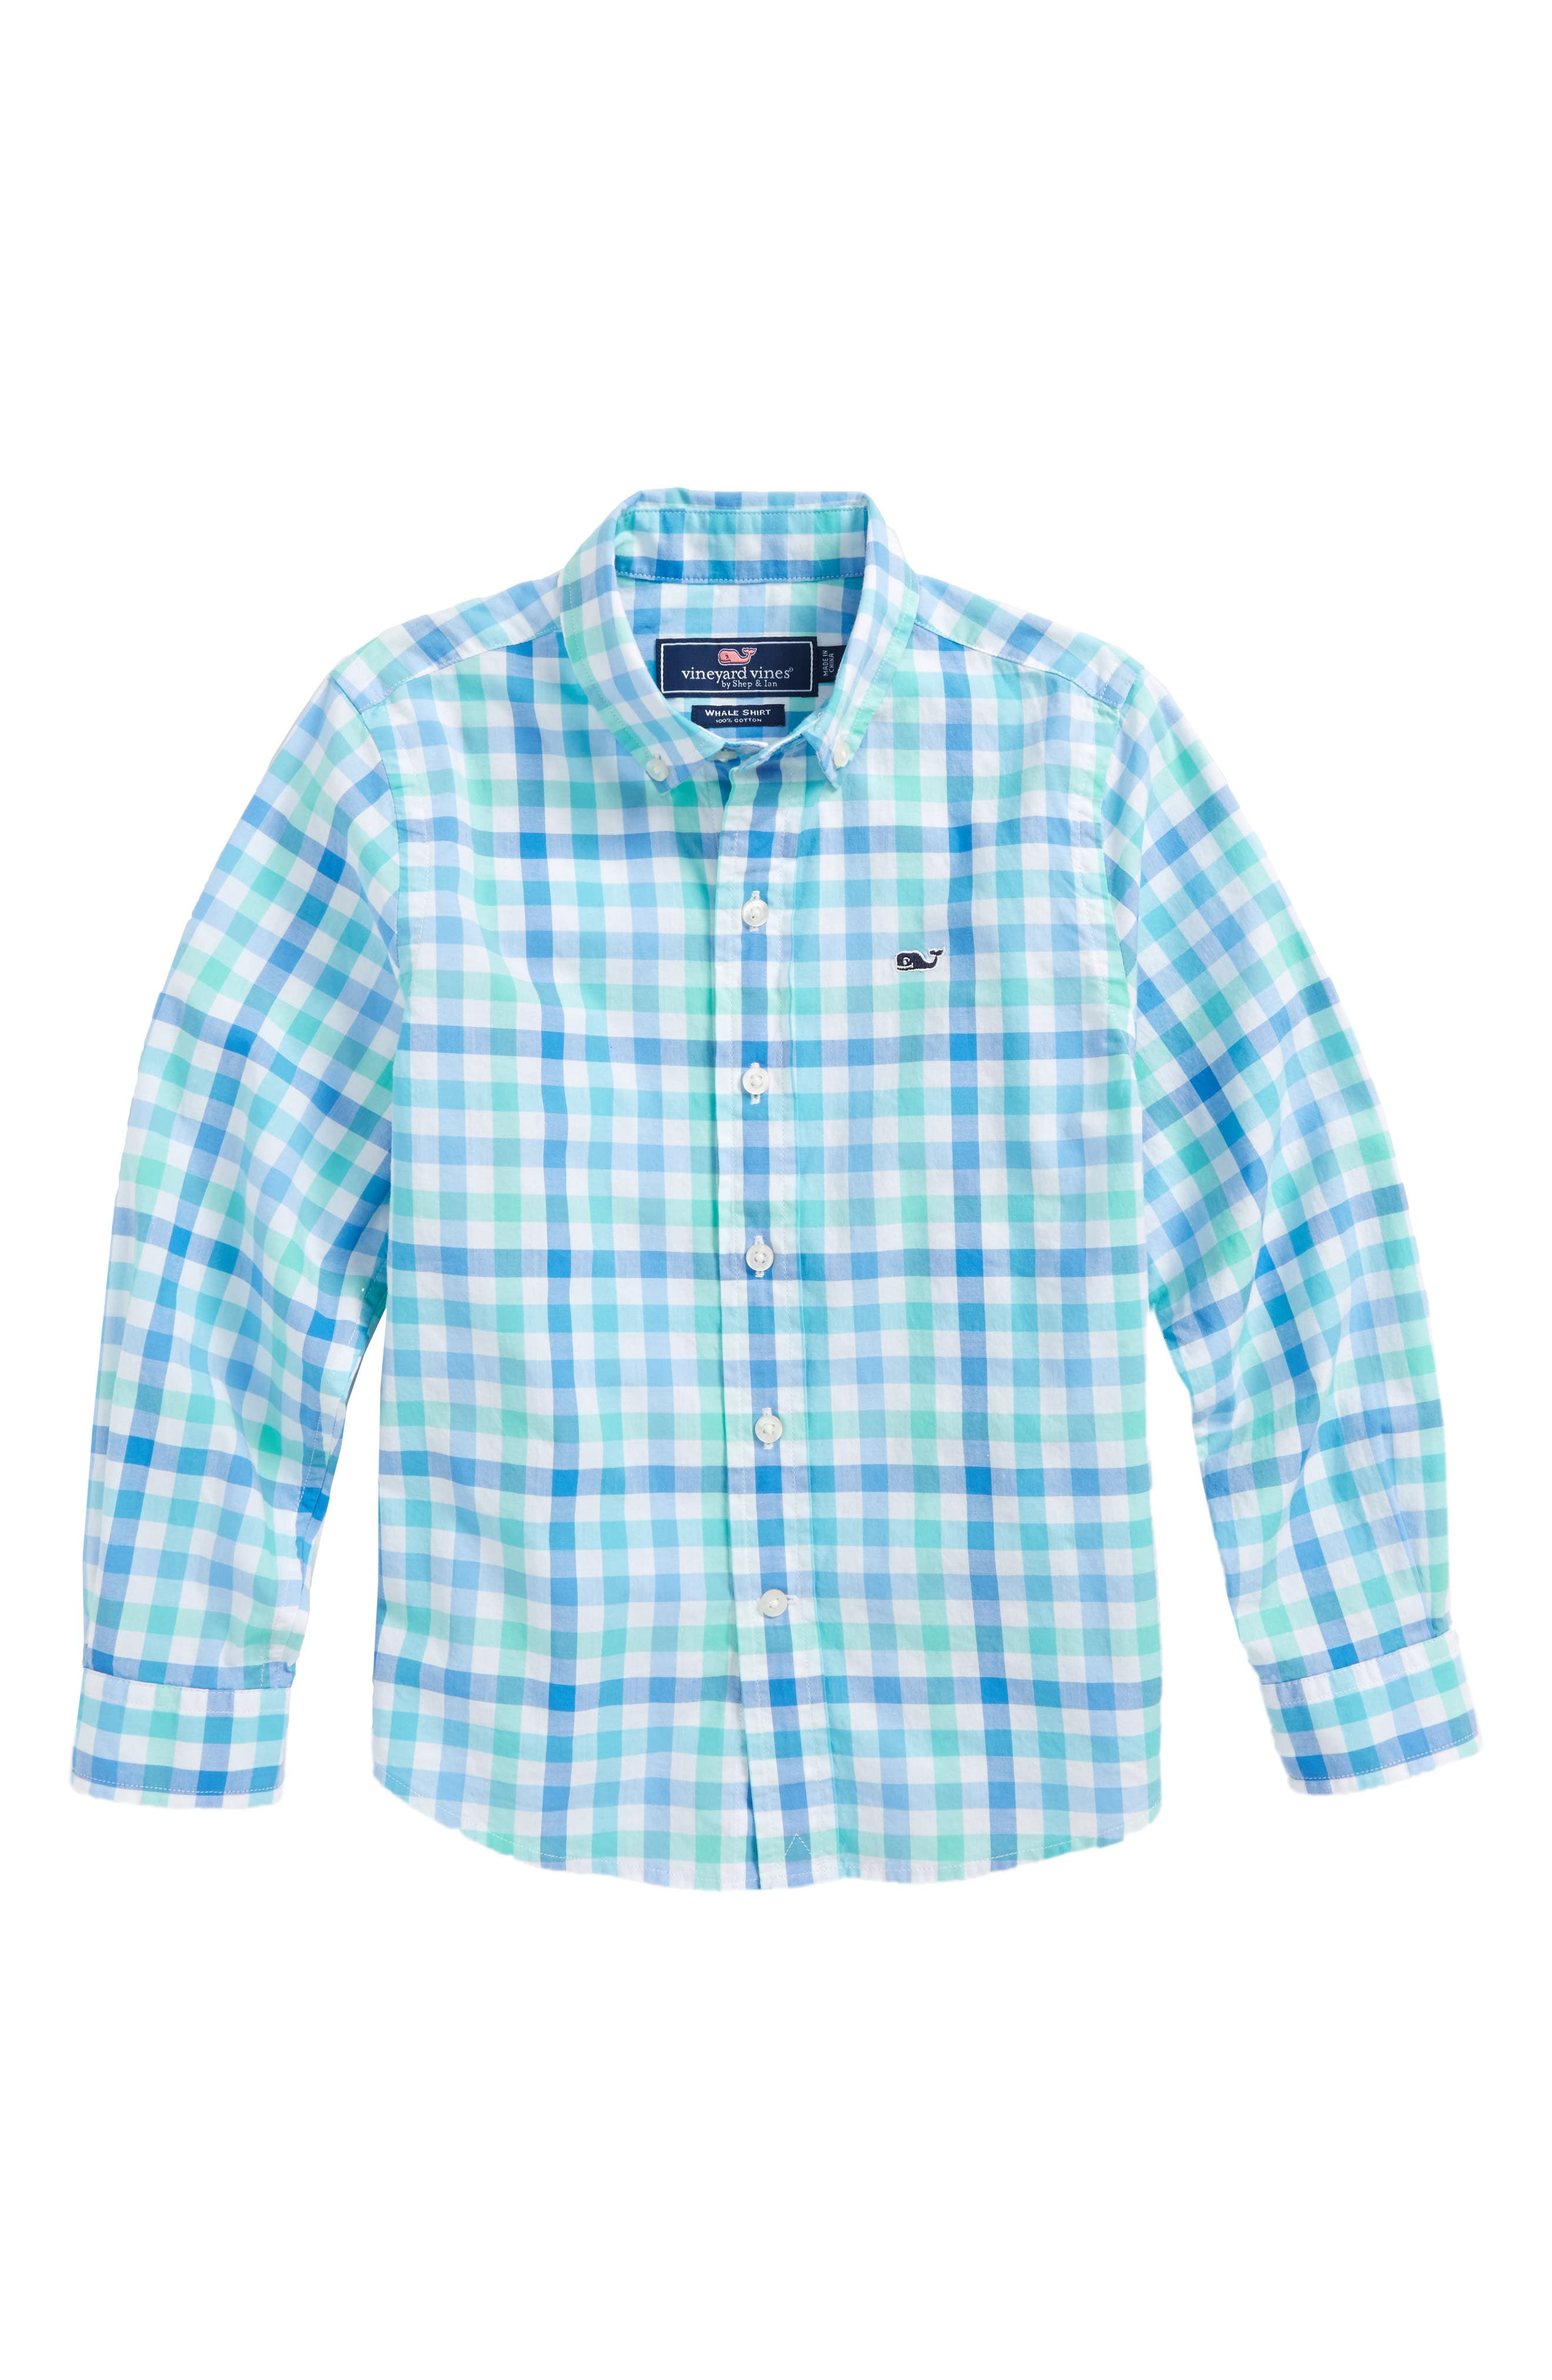 Eagle's Nest Gingham Dress Shirt,                             Main thumbnail 1, color,                             Turqs